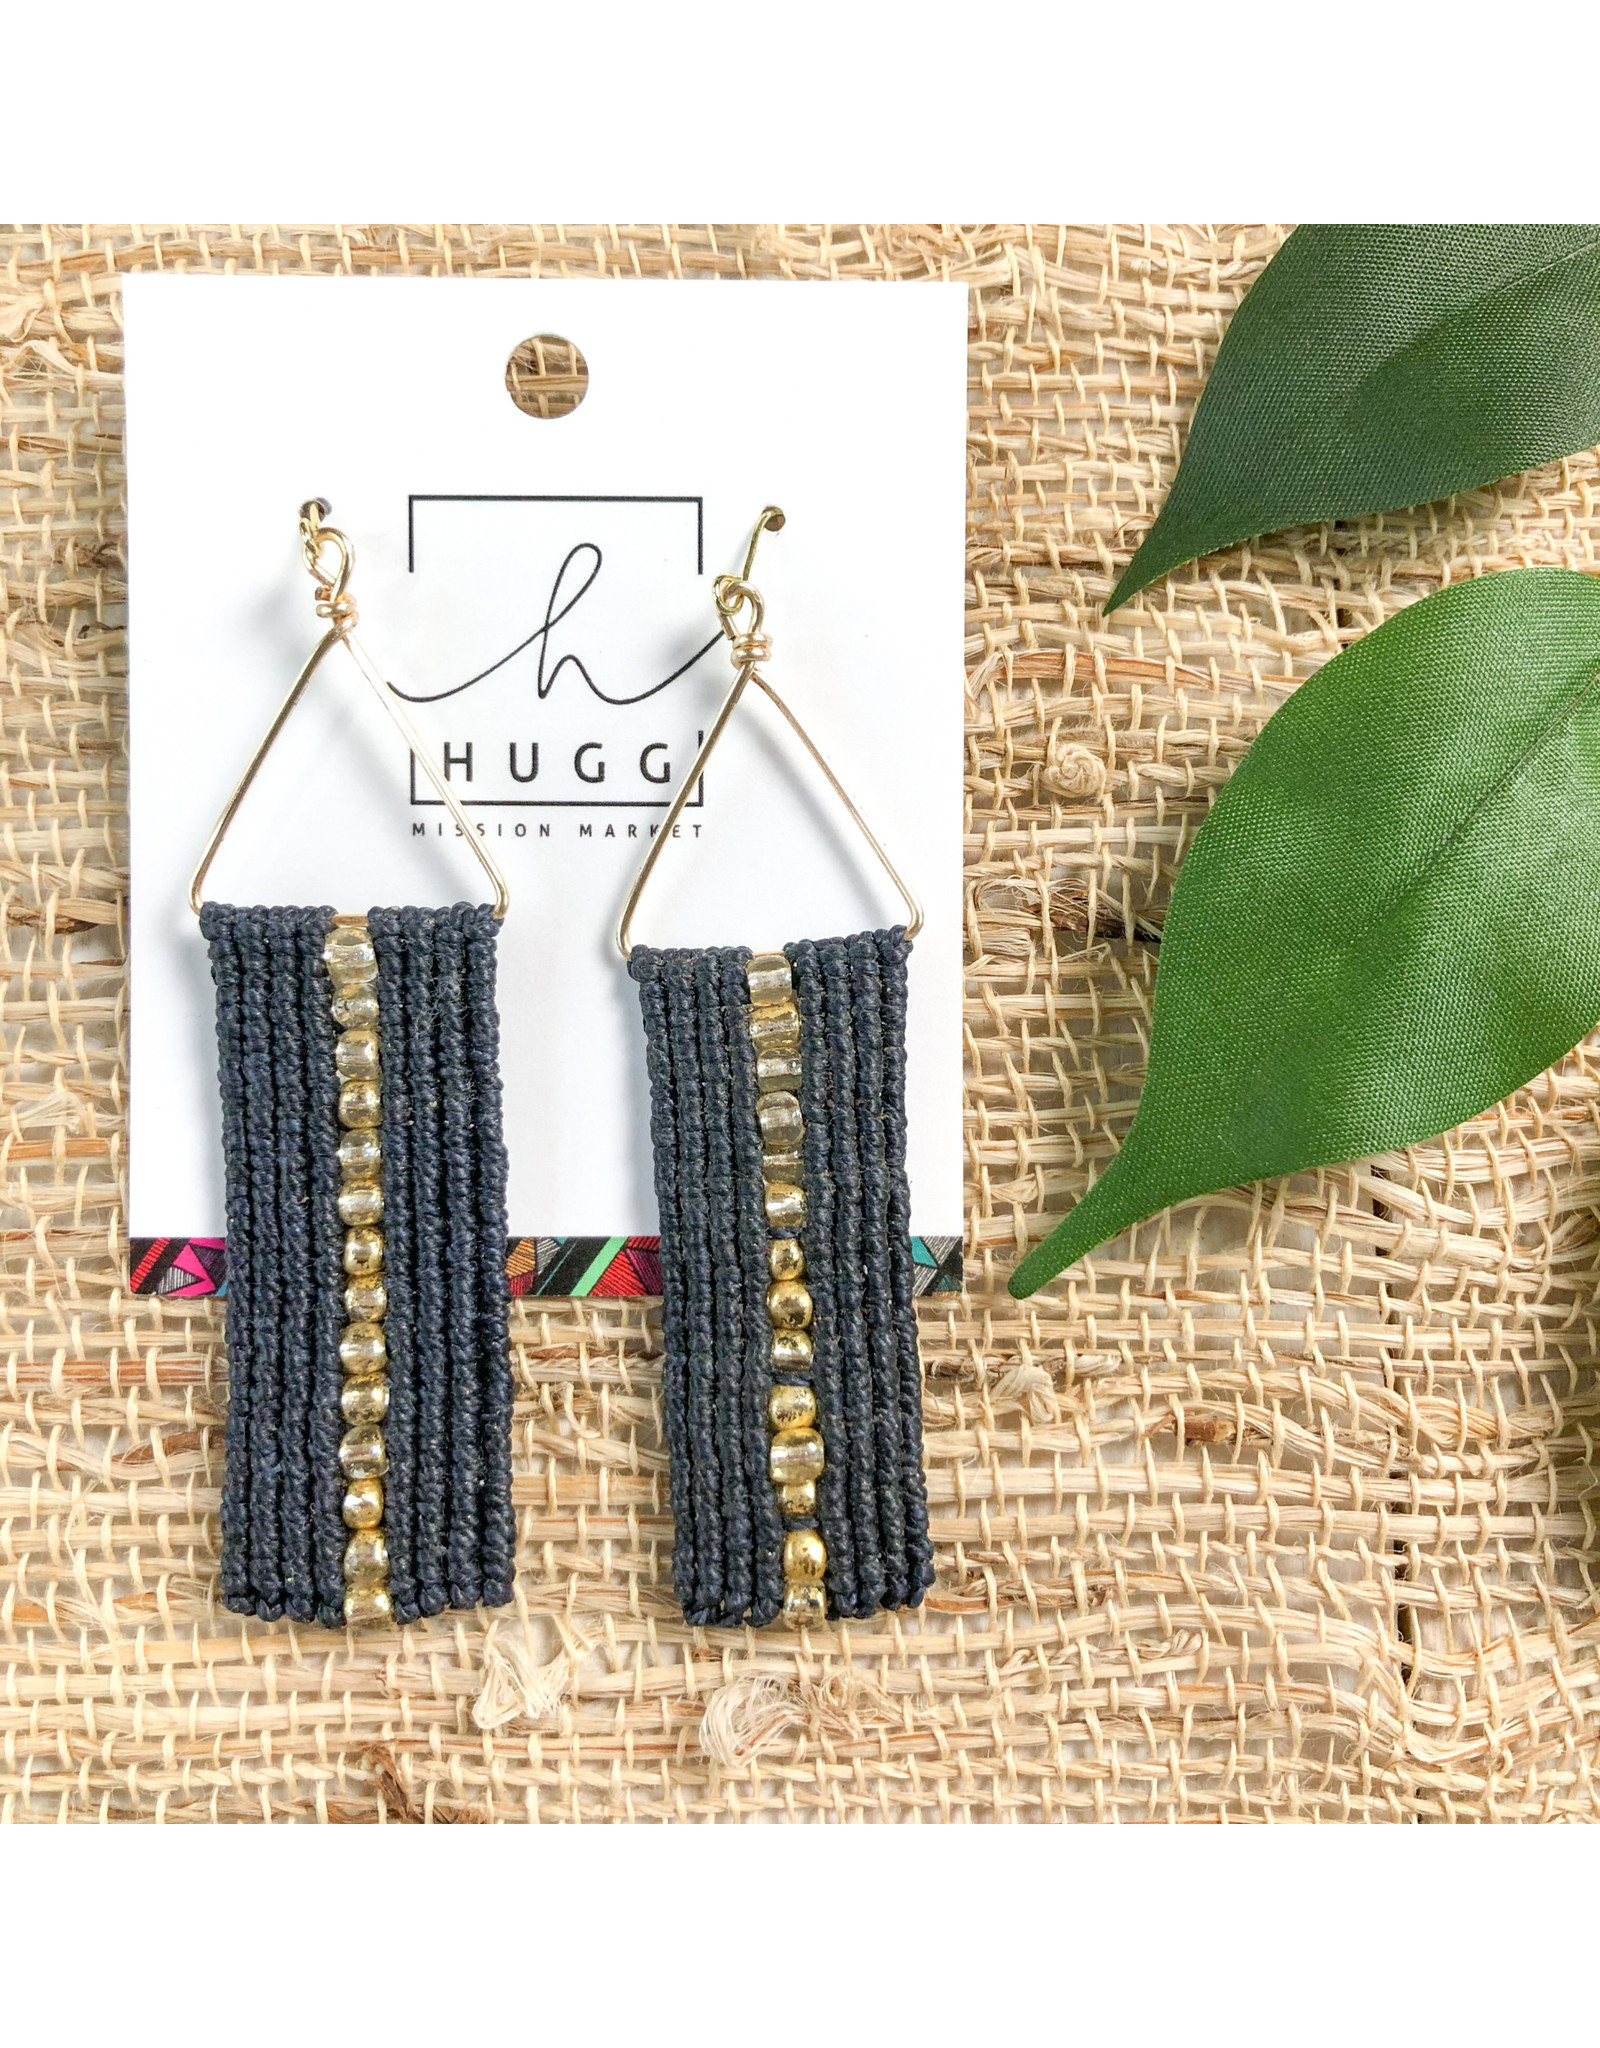 Hugg Mission Market Isabelle Earrings - Navy